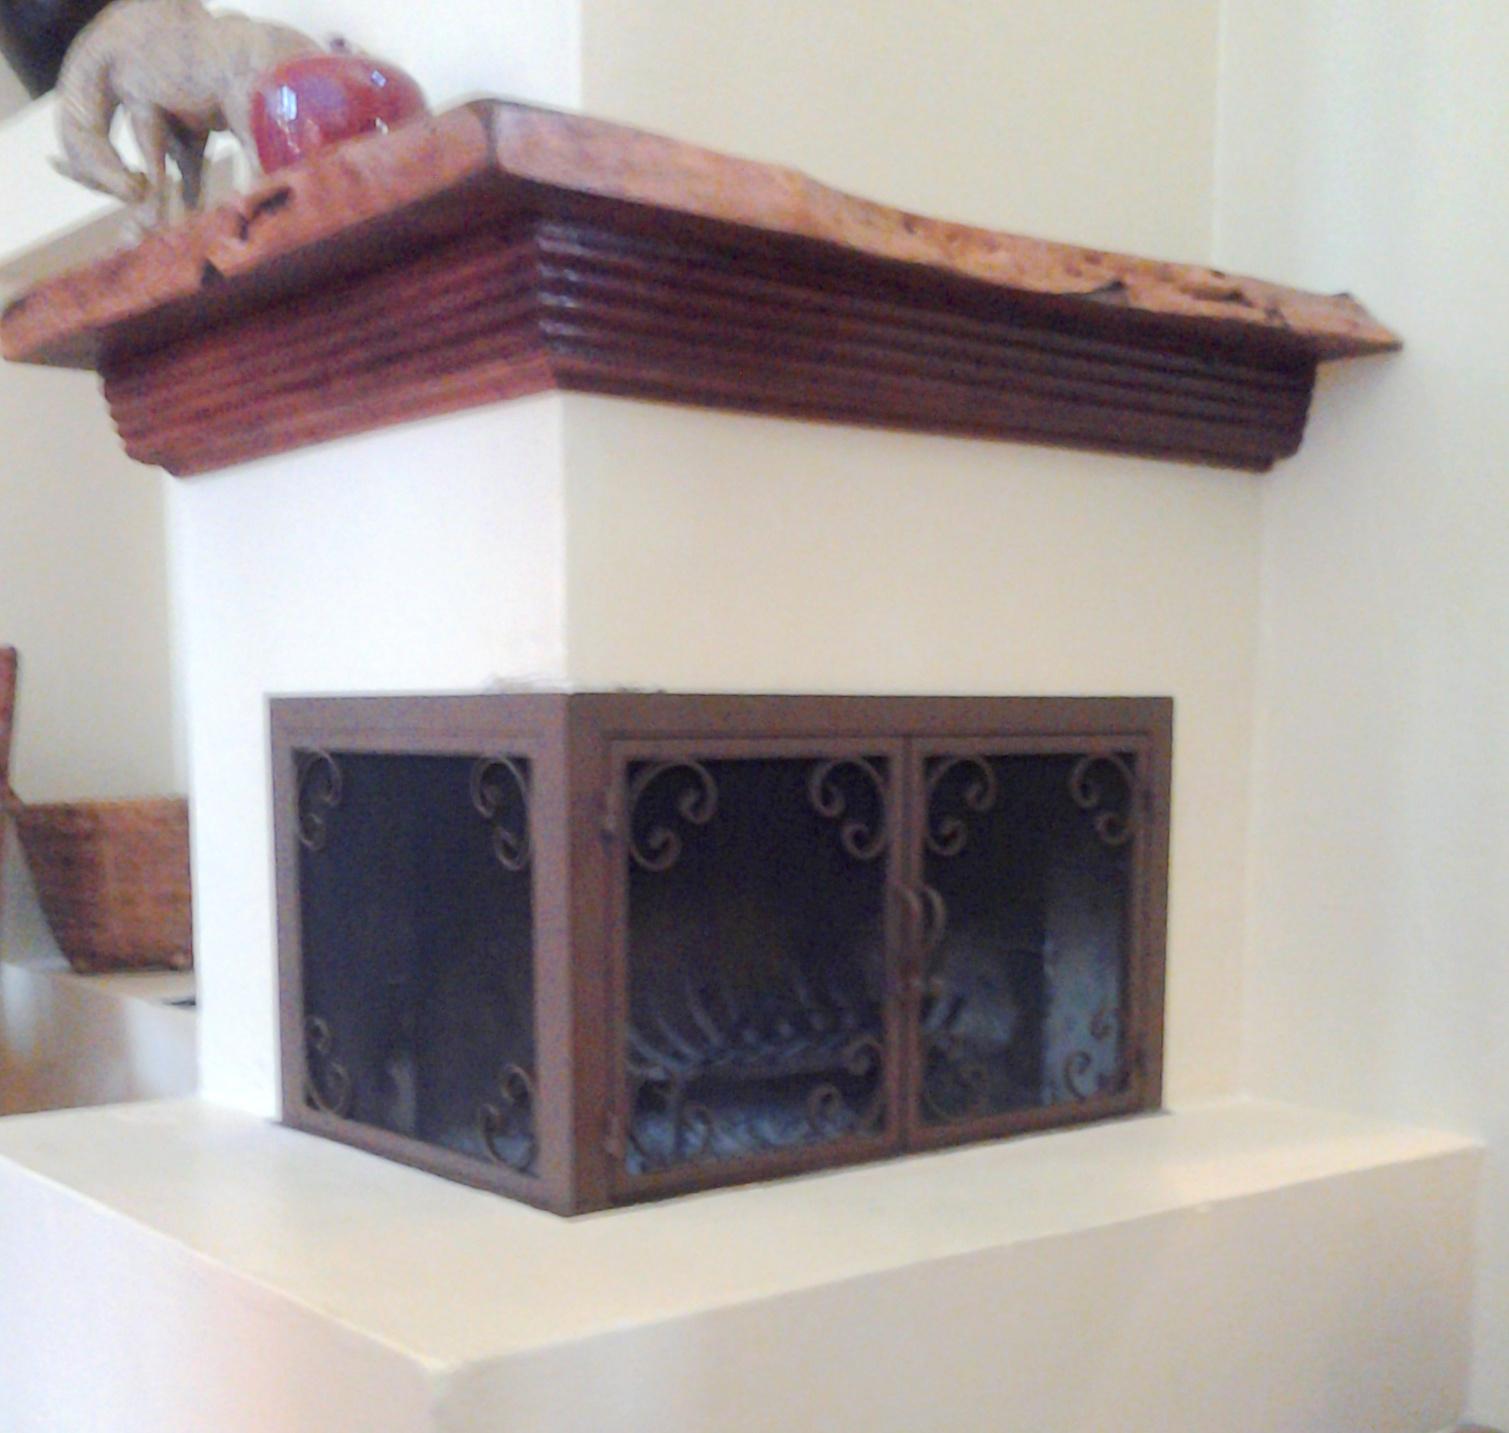 Fire Screen For Corner Fireplace IronCraft In AZ